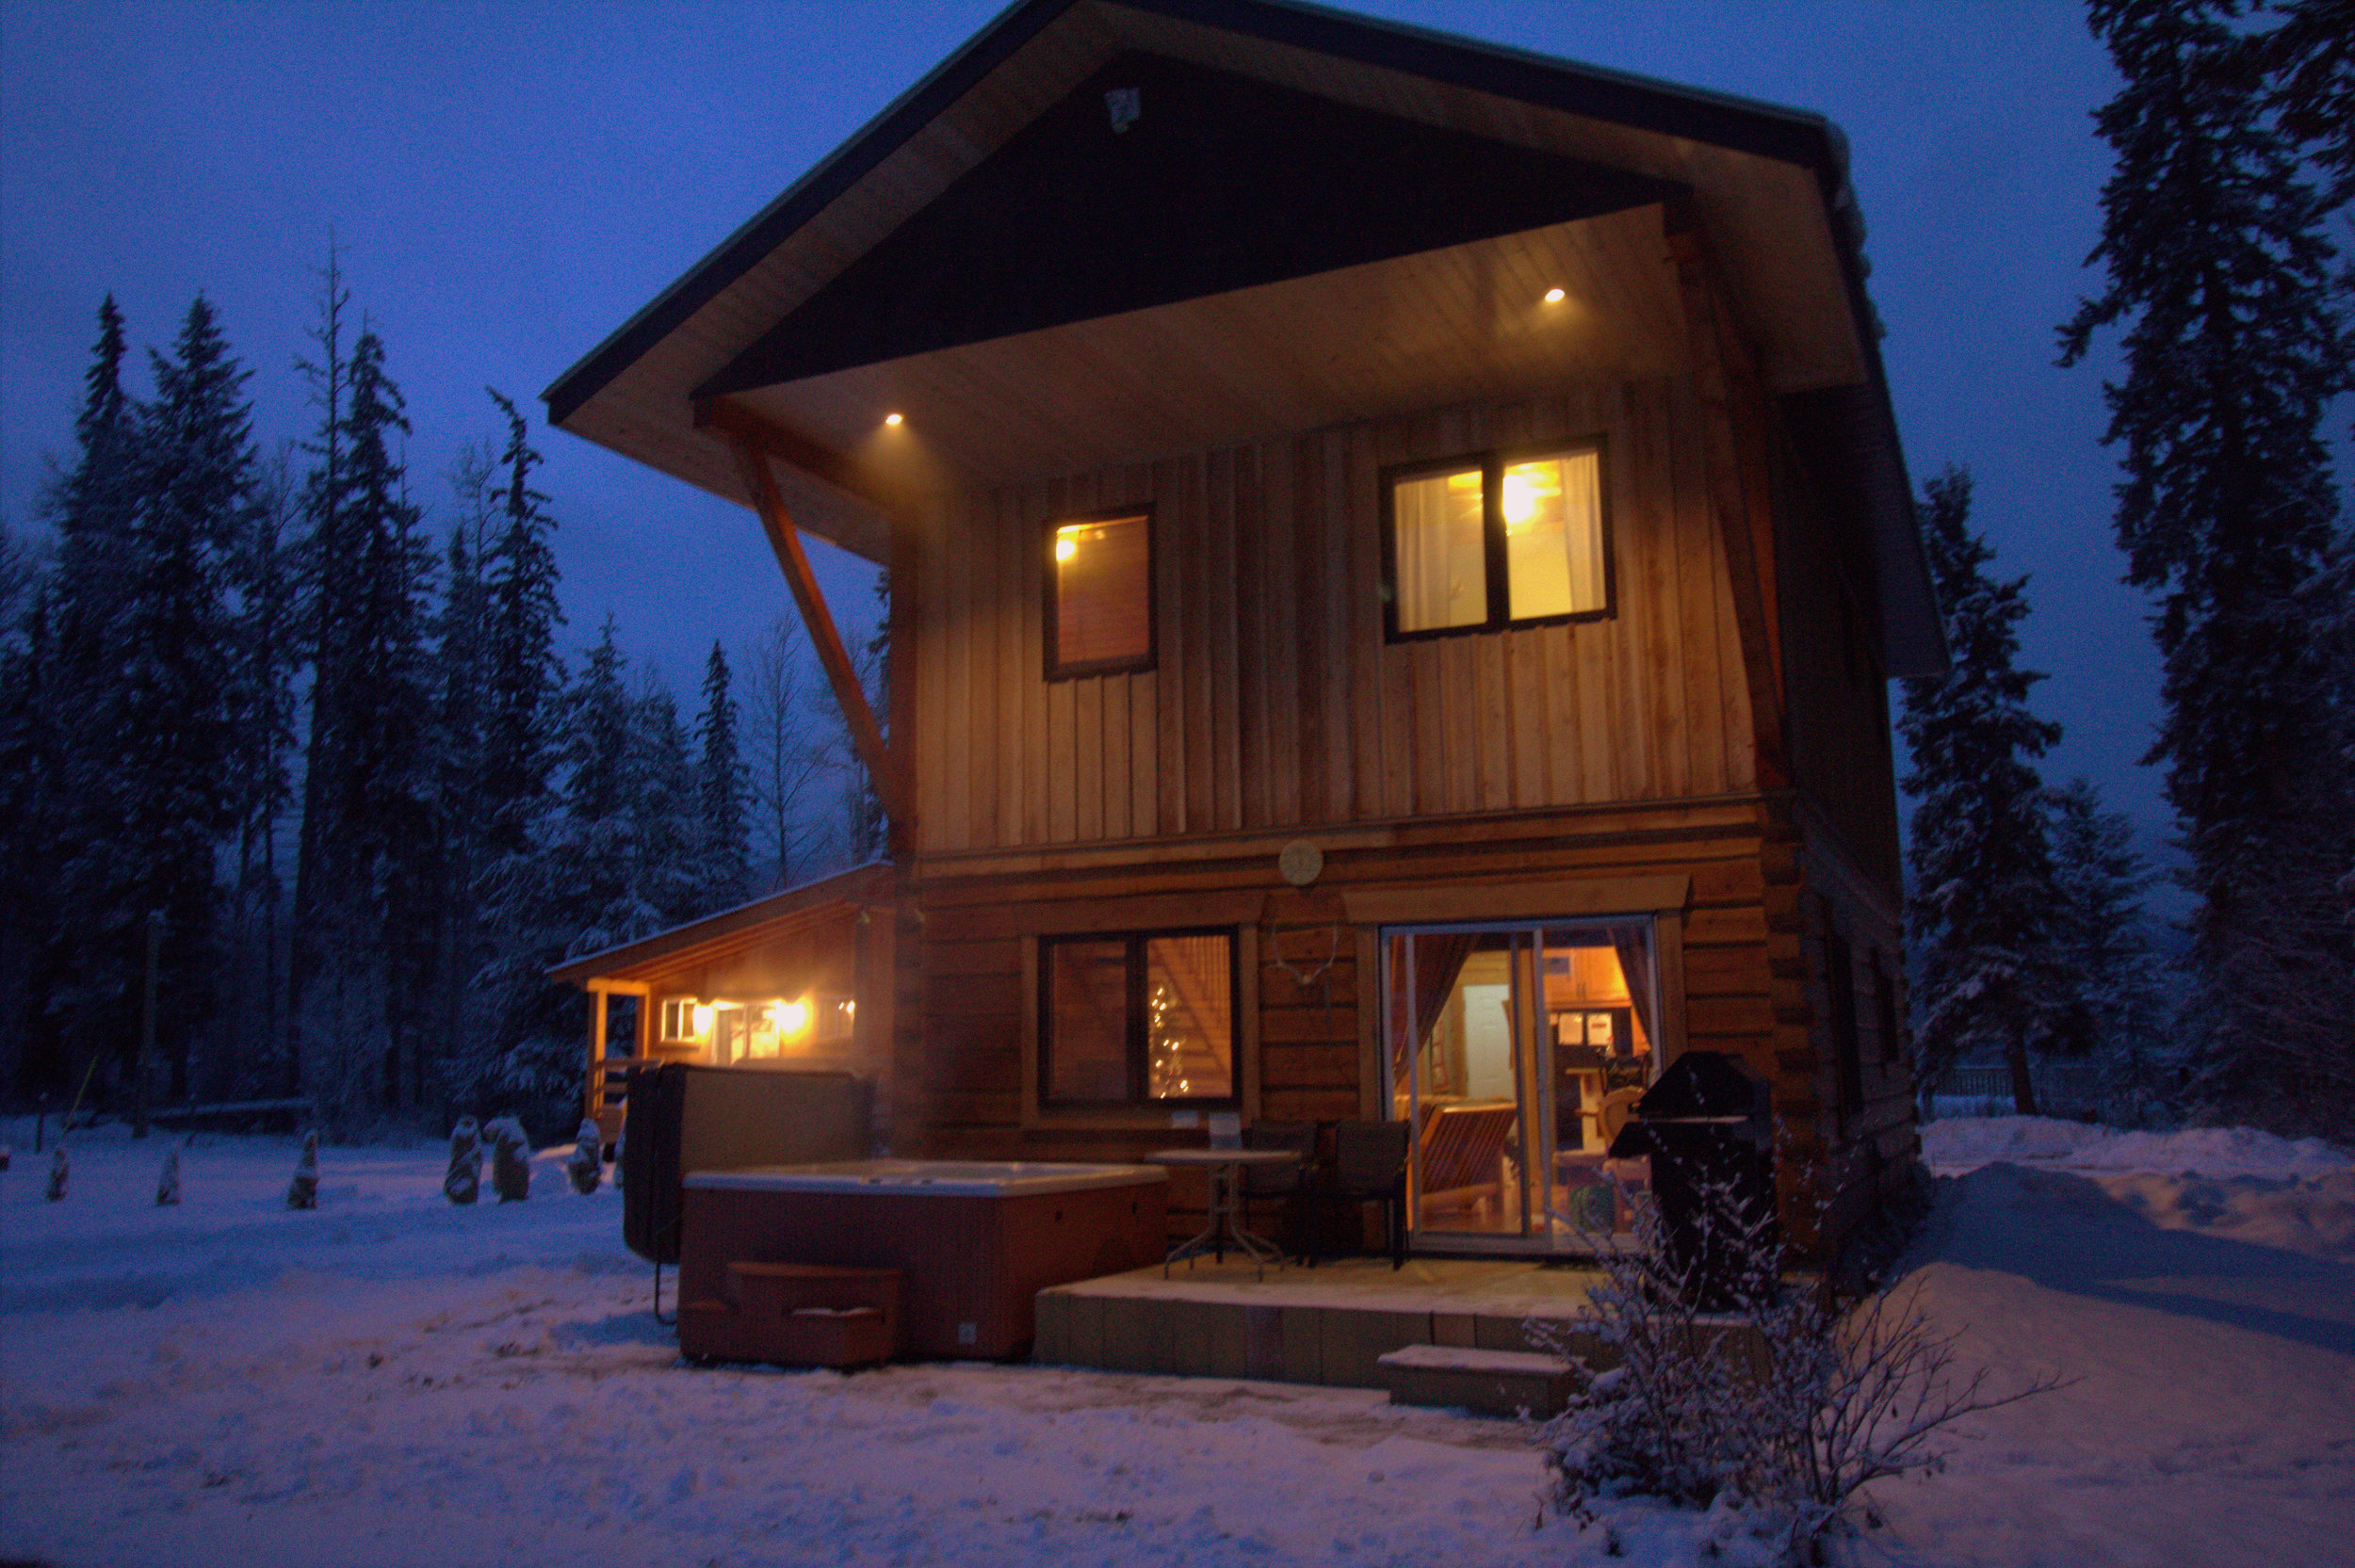 Lodge with hot tub at night.jpg